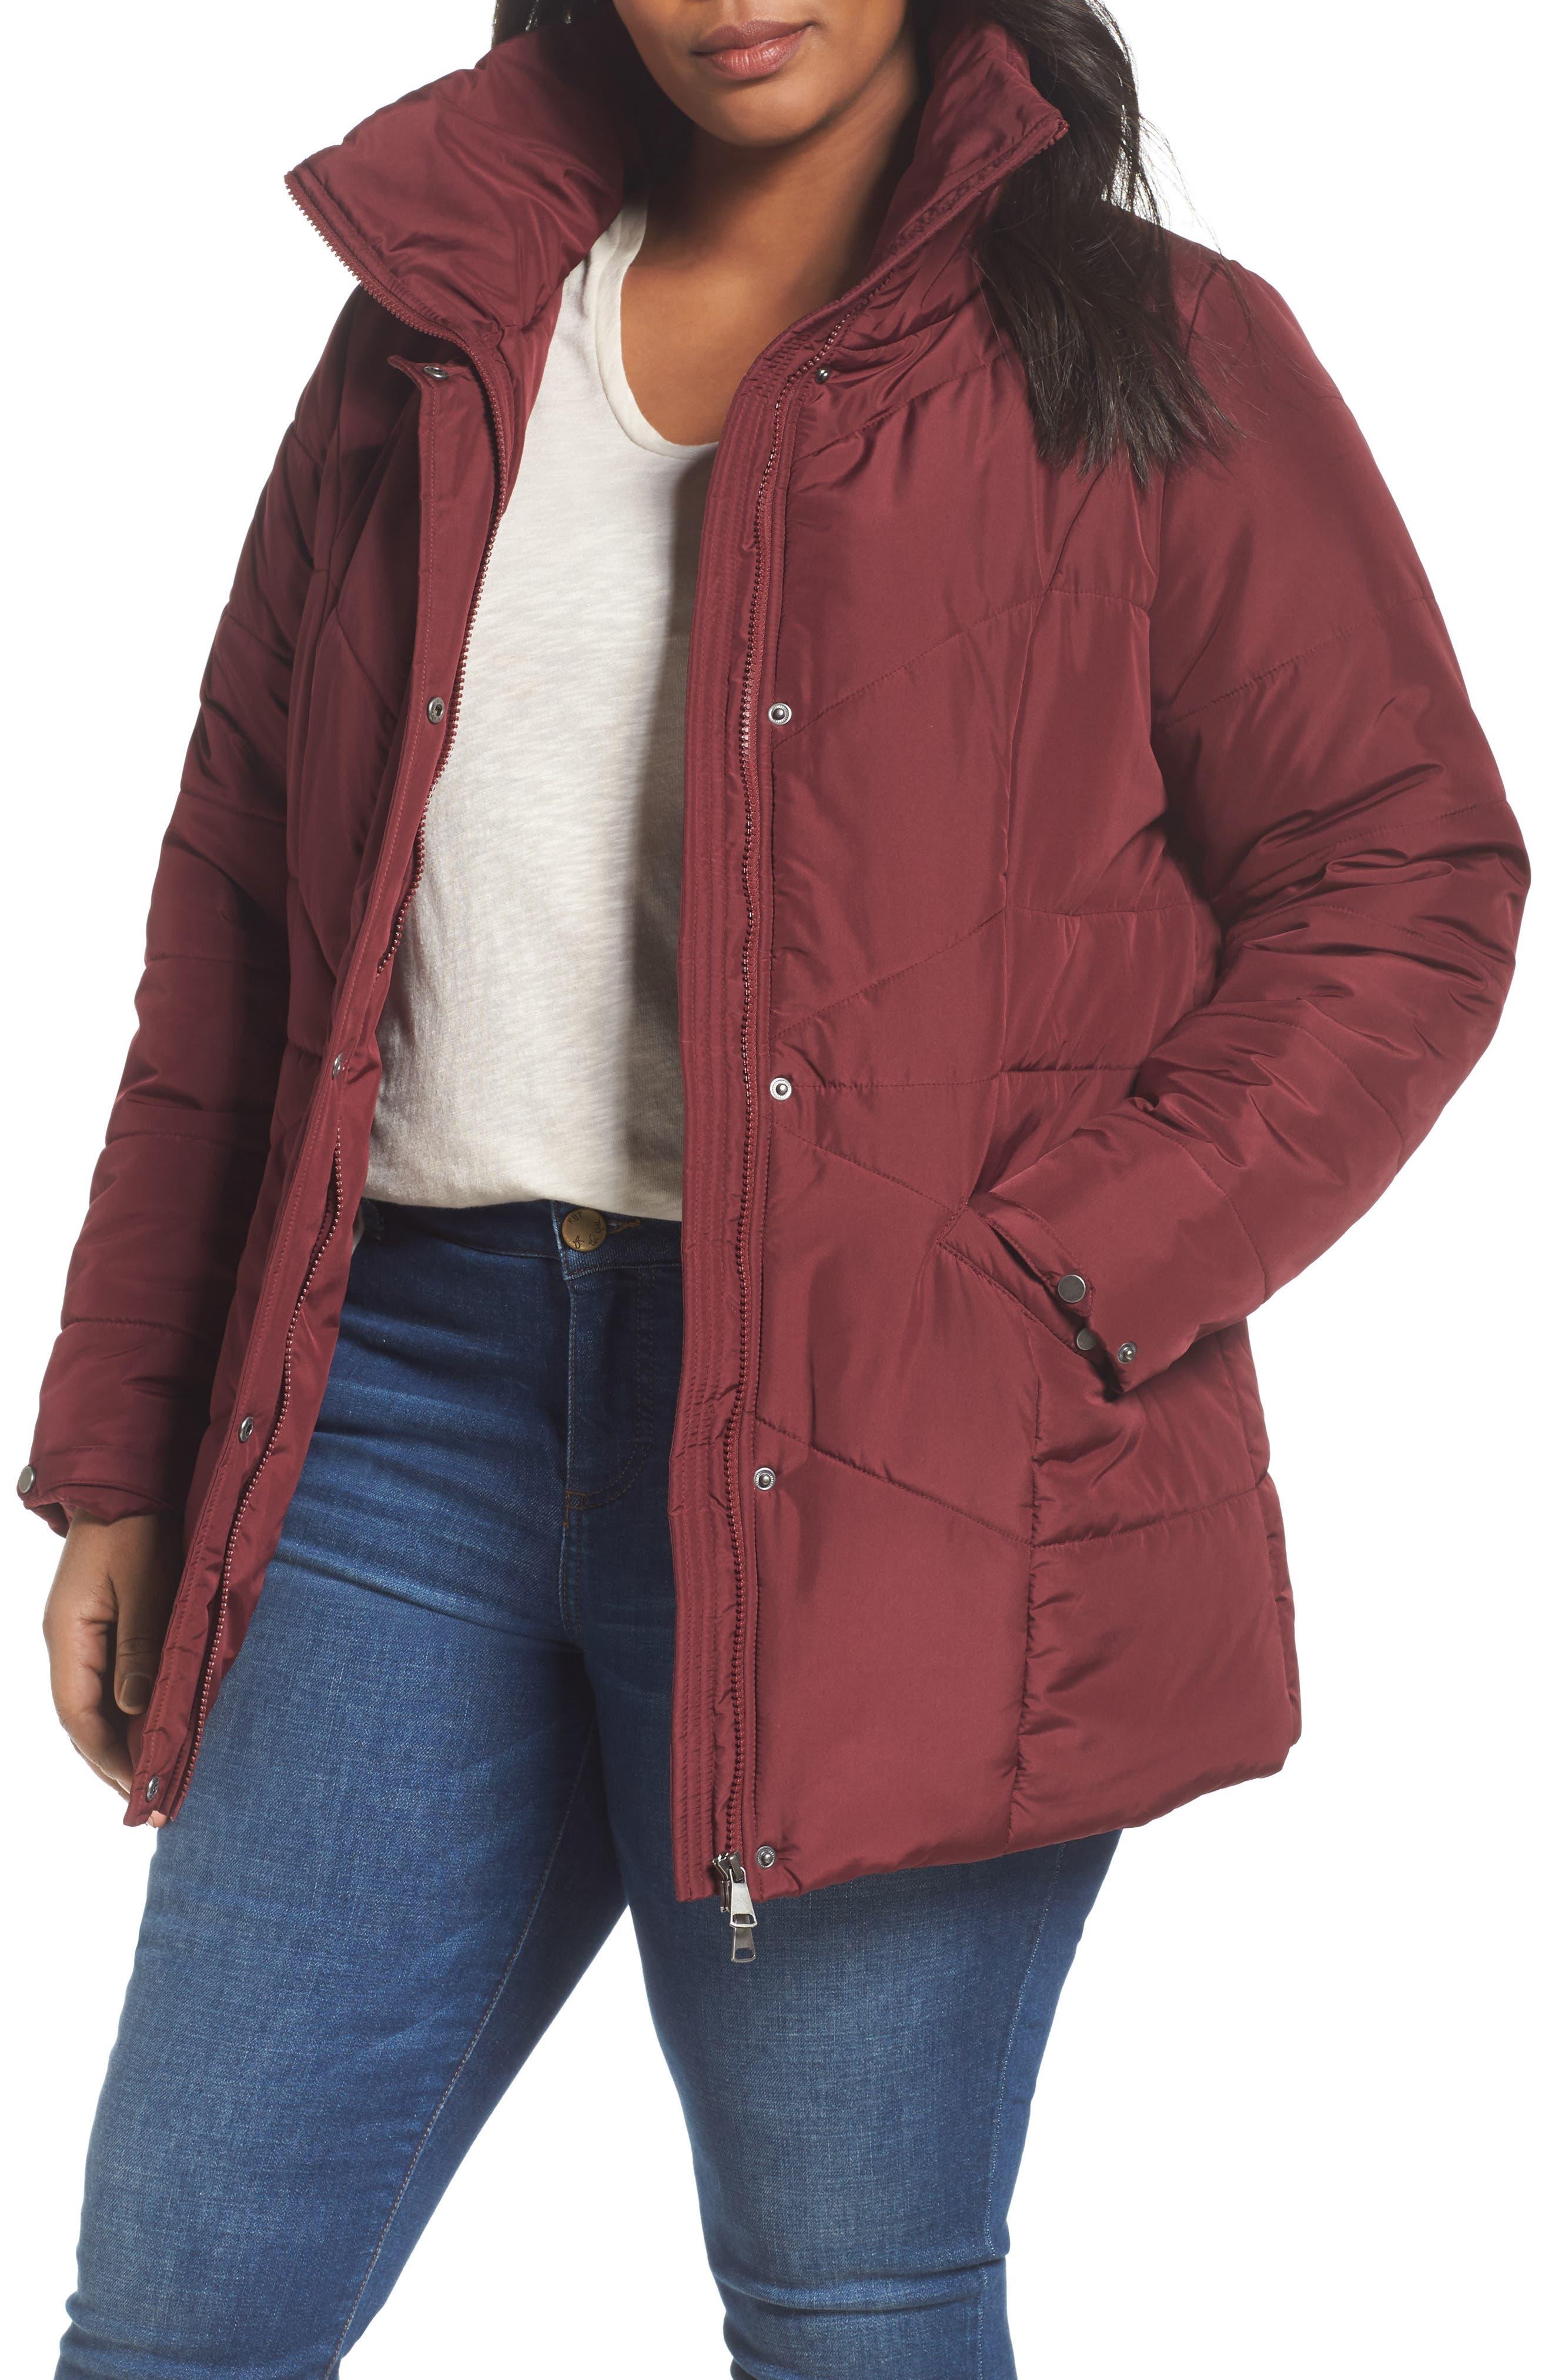 Alternate Image 1 Selected - JUNAROSE Valsi Puffer Jacket (Plus Size)